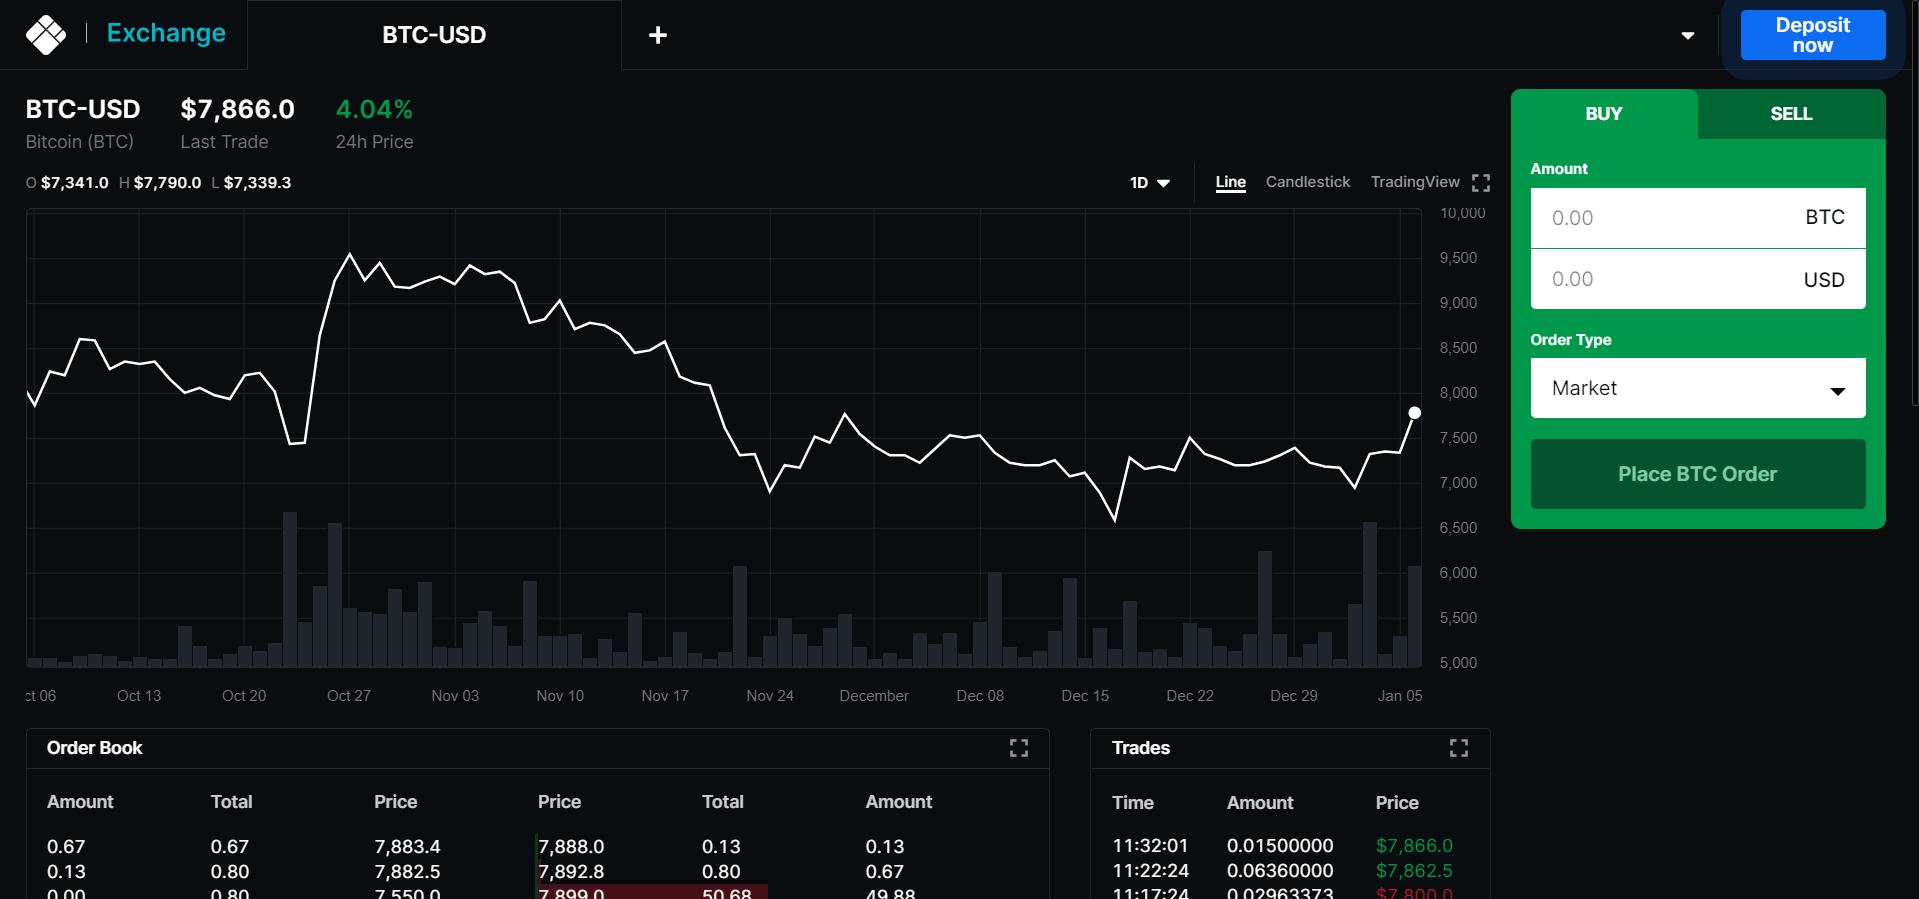 Blockchain Exchange Trading View